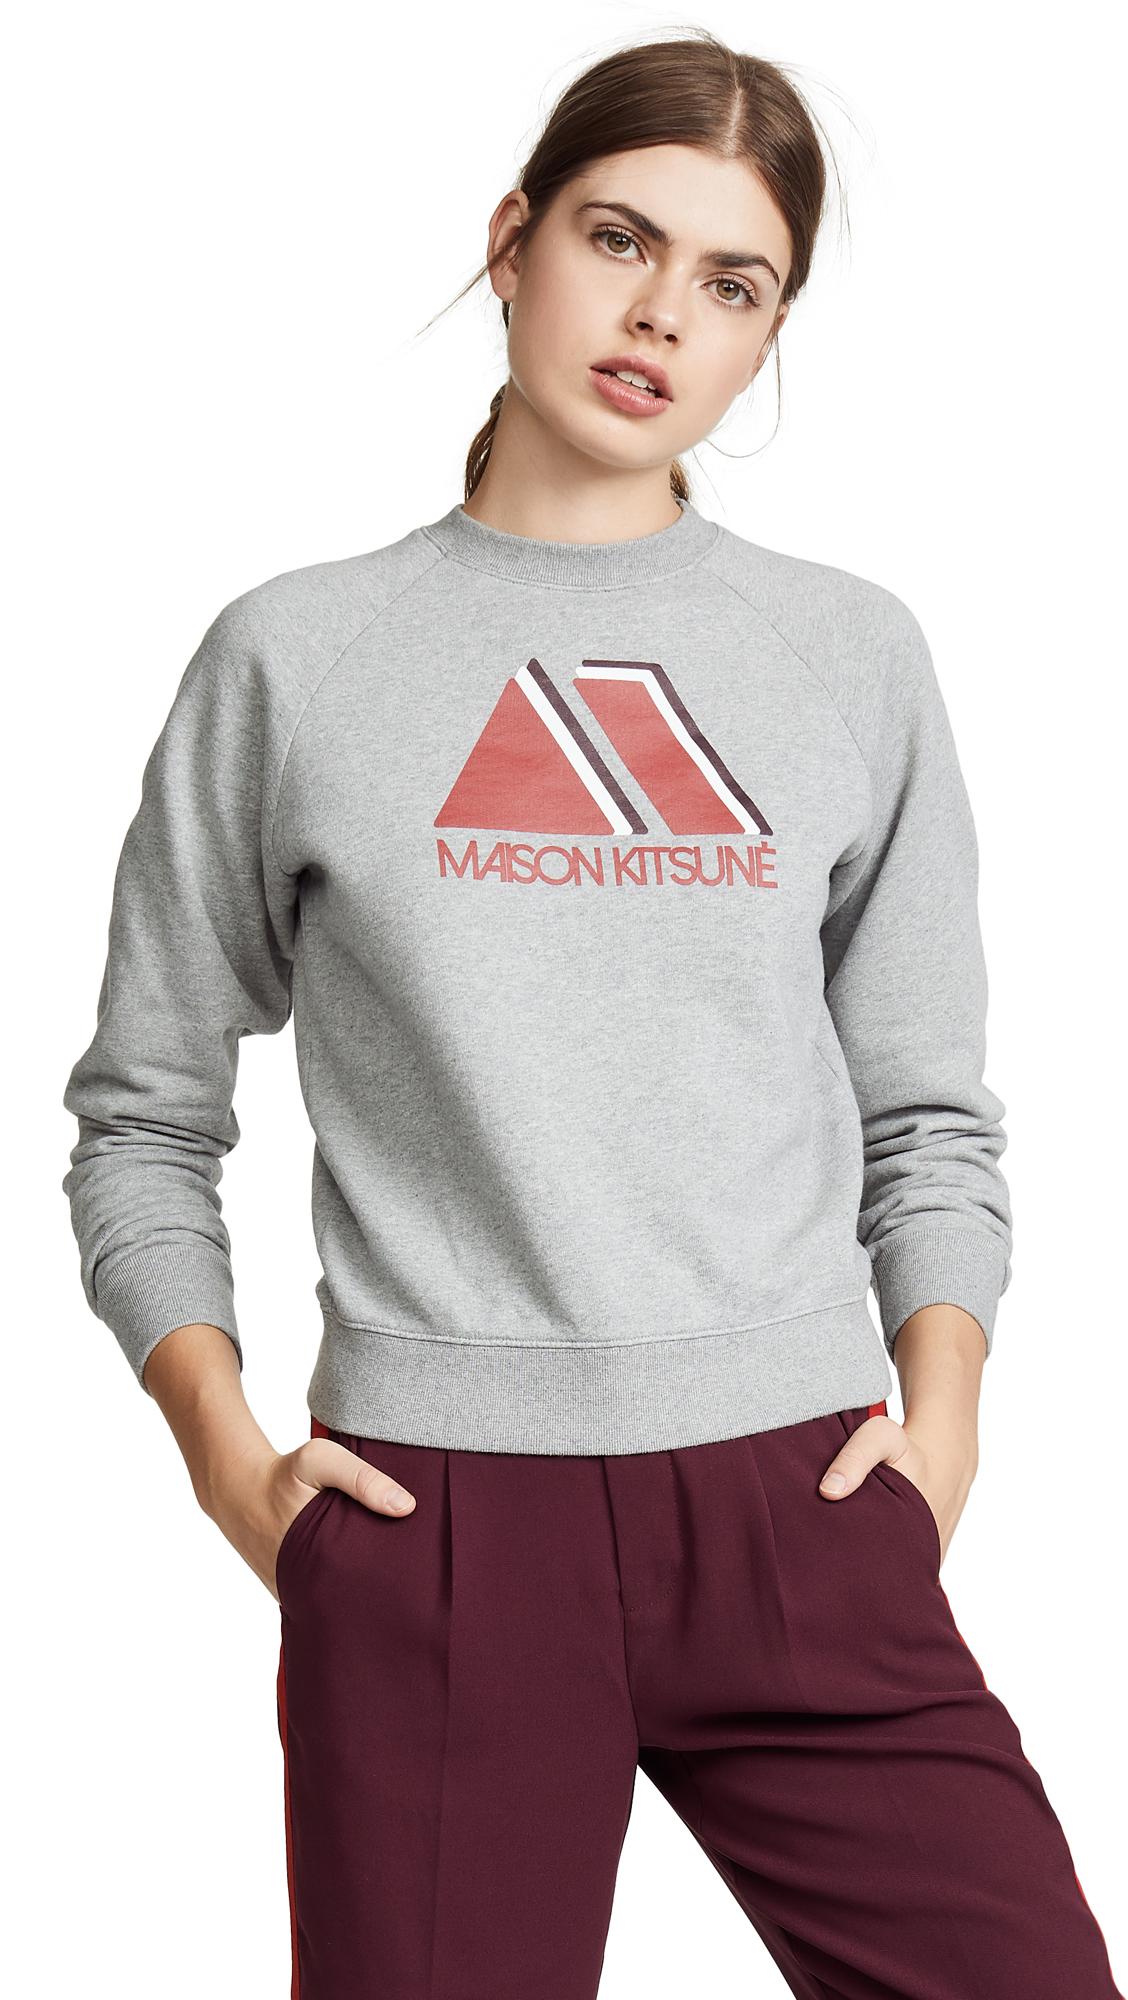 Maison Kitsune Triangle Sweatshirt In Grey Melange